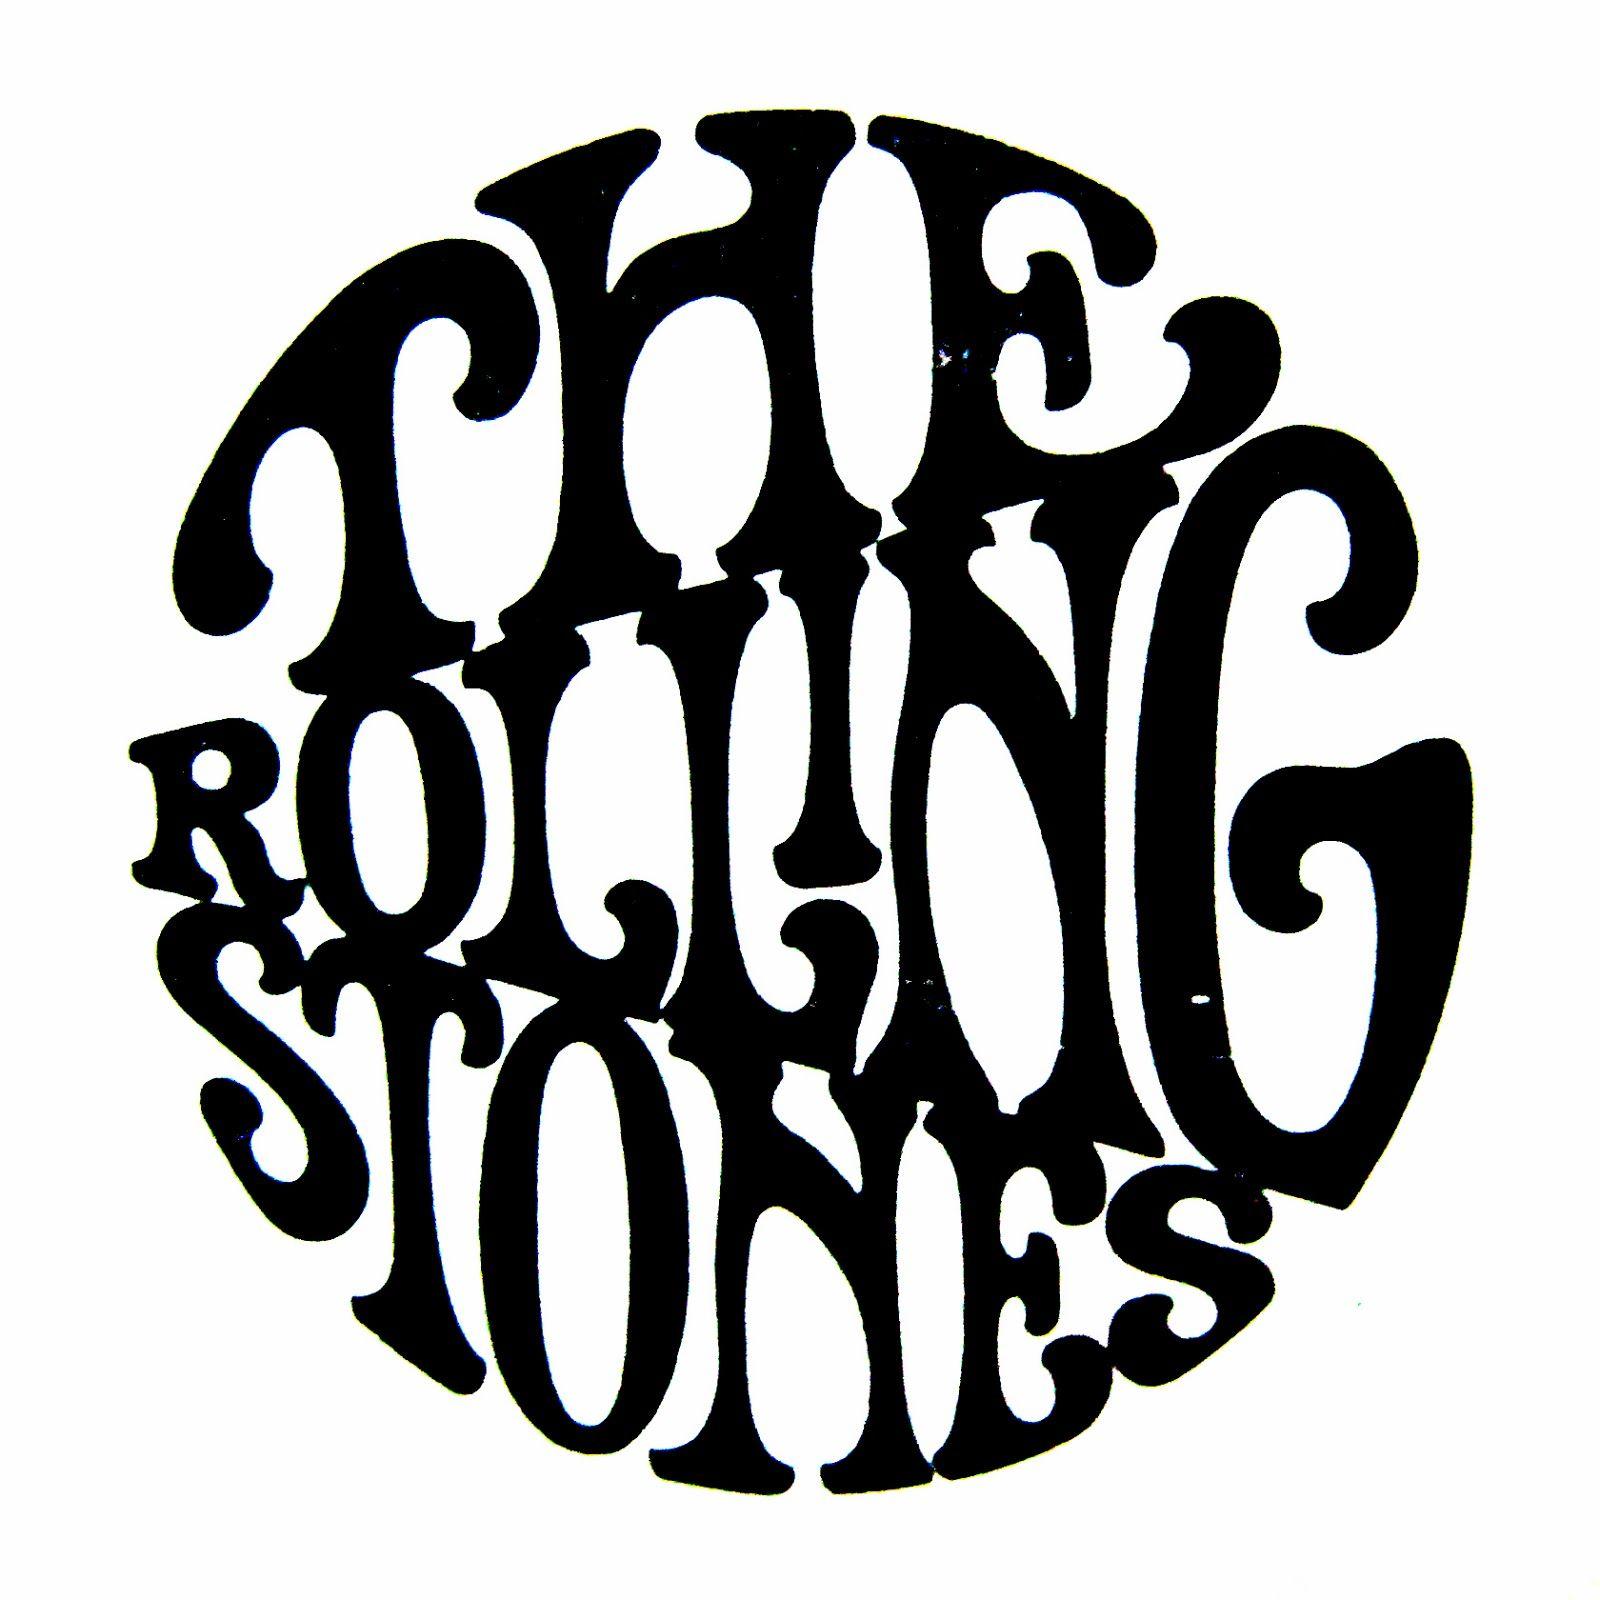 Rolling Stones Alternative Logo | Stones in 2019 | Rolling